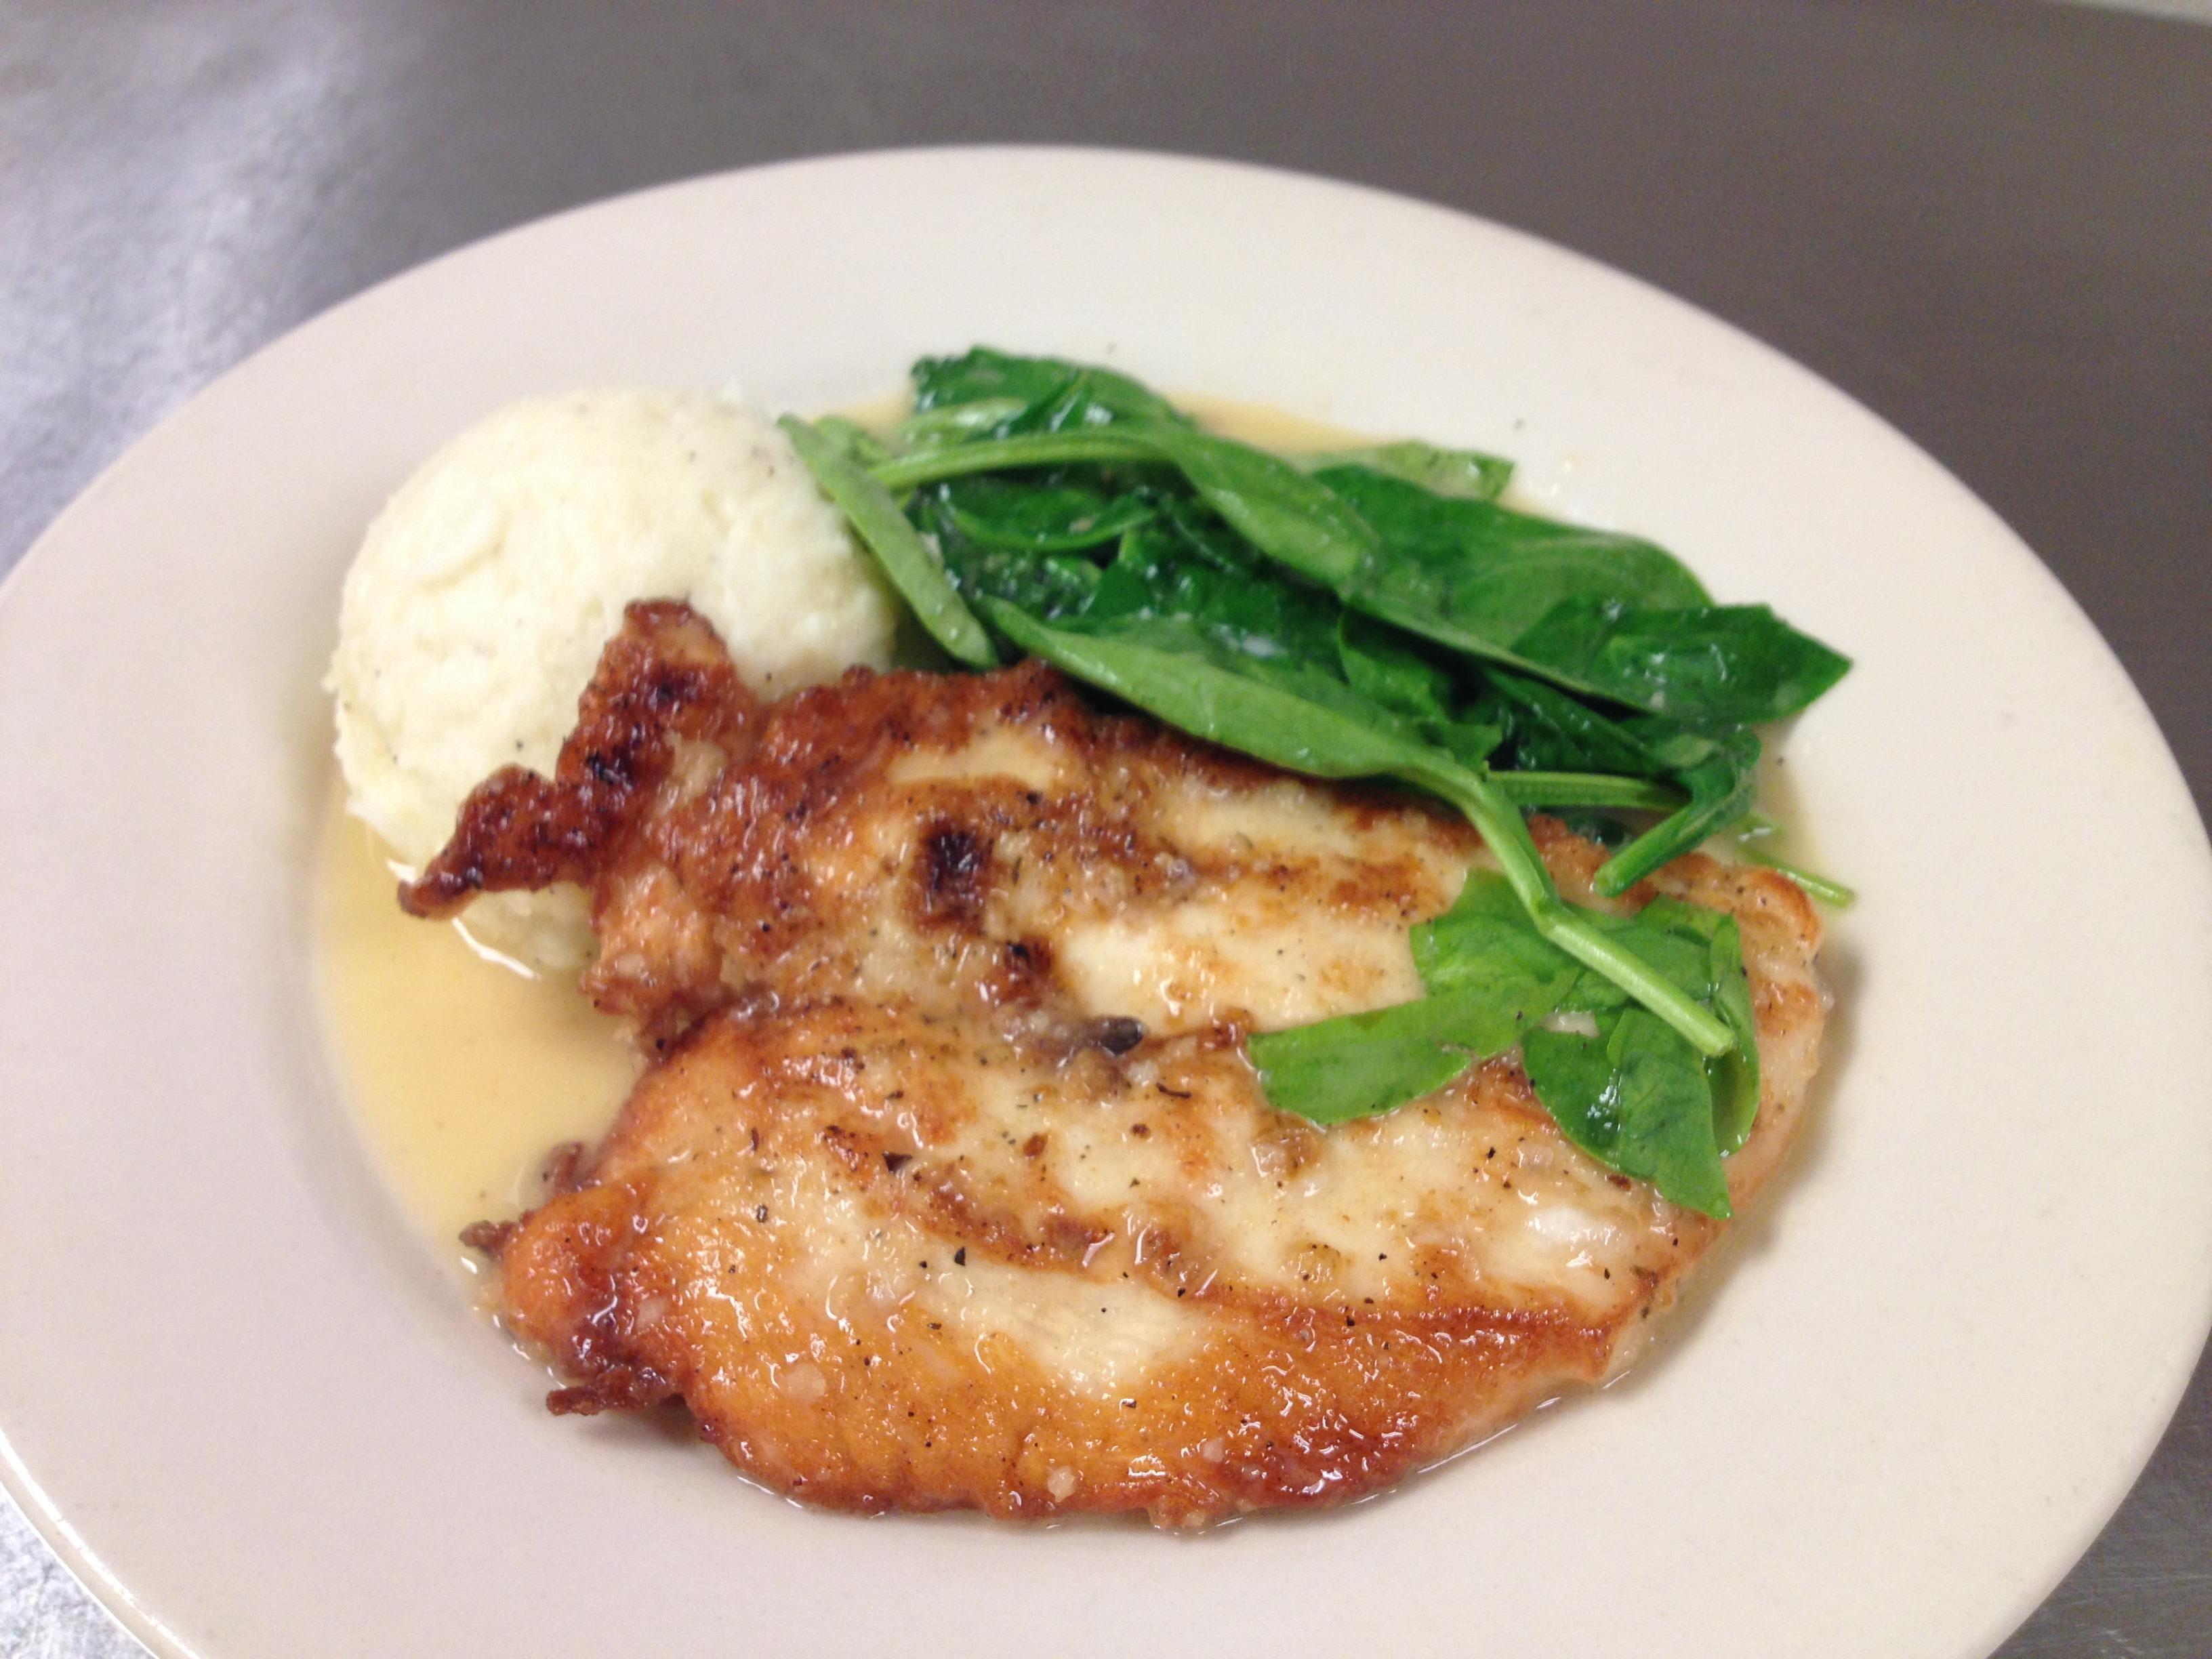 Lemon Chicken at Sir Edmond Halley's